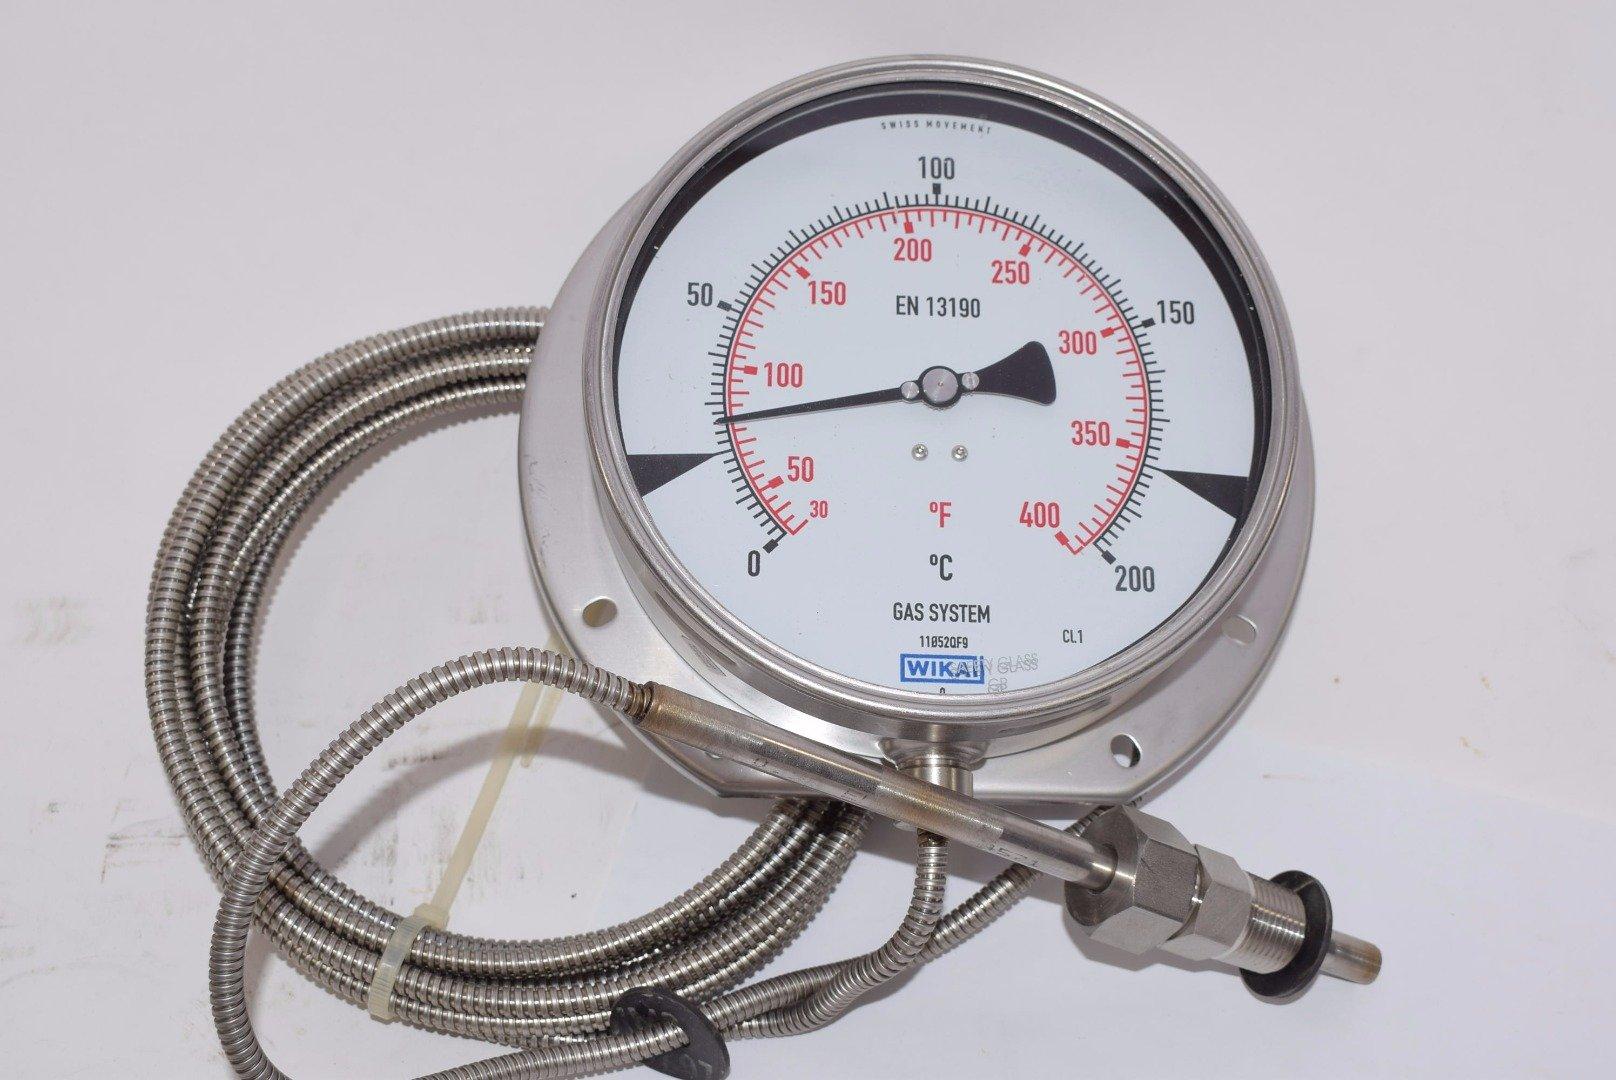 WIKA EN 13190 GAS ACTUATED THERMOMETER Sensor 6'' Gauge 11052QF9 0-400 deg